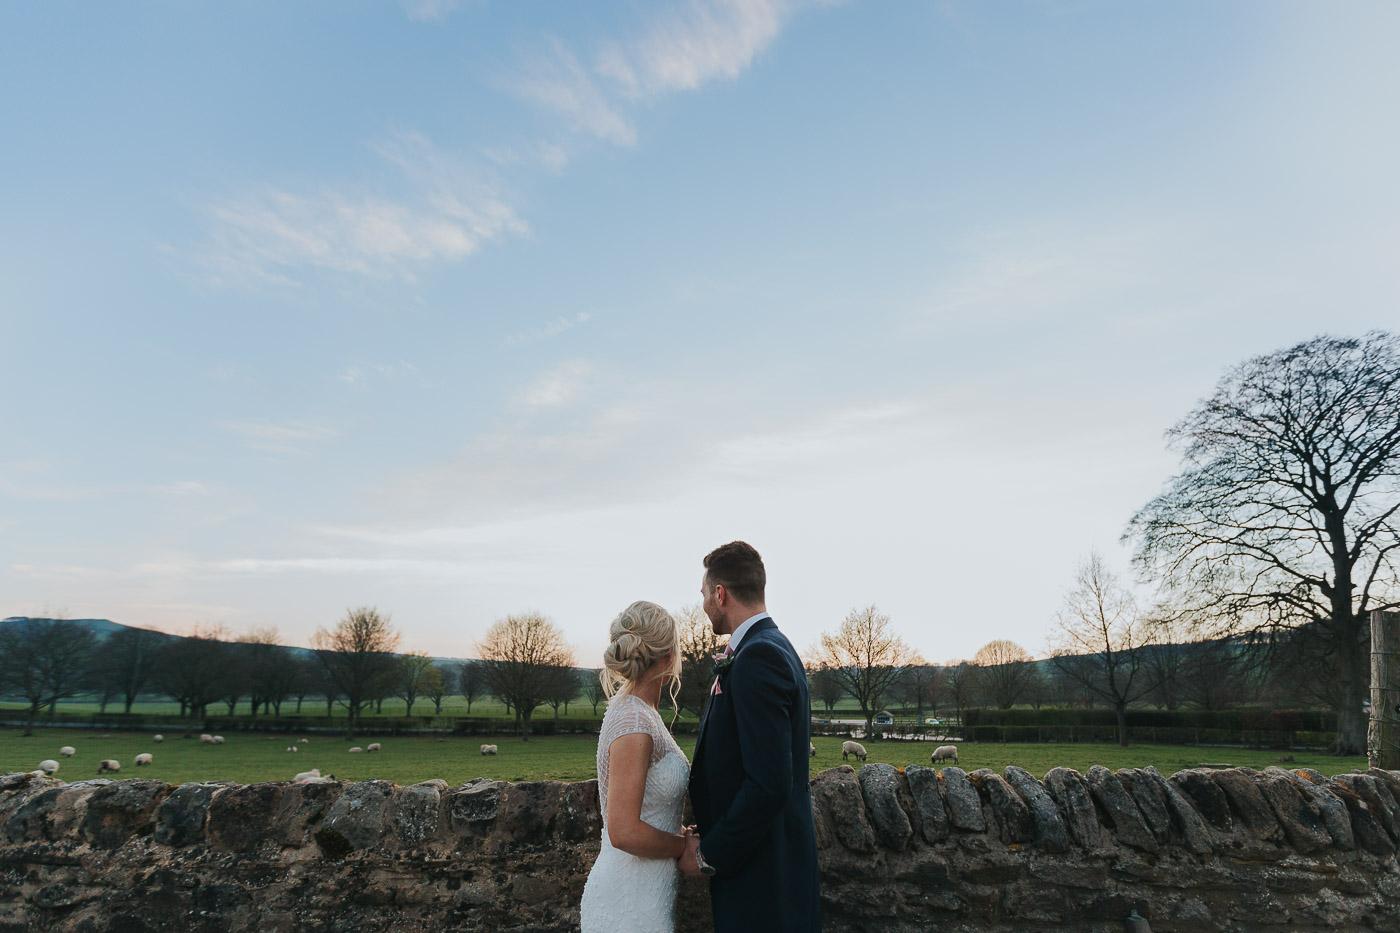 Tithe+Barn+-+Laura+Calderwood+Photography+-+29.3.19+-+Mr+&+Mrs+Lancaster290319-175 (2).jpg